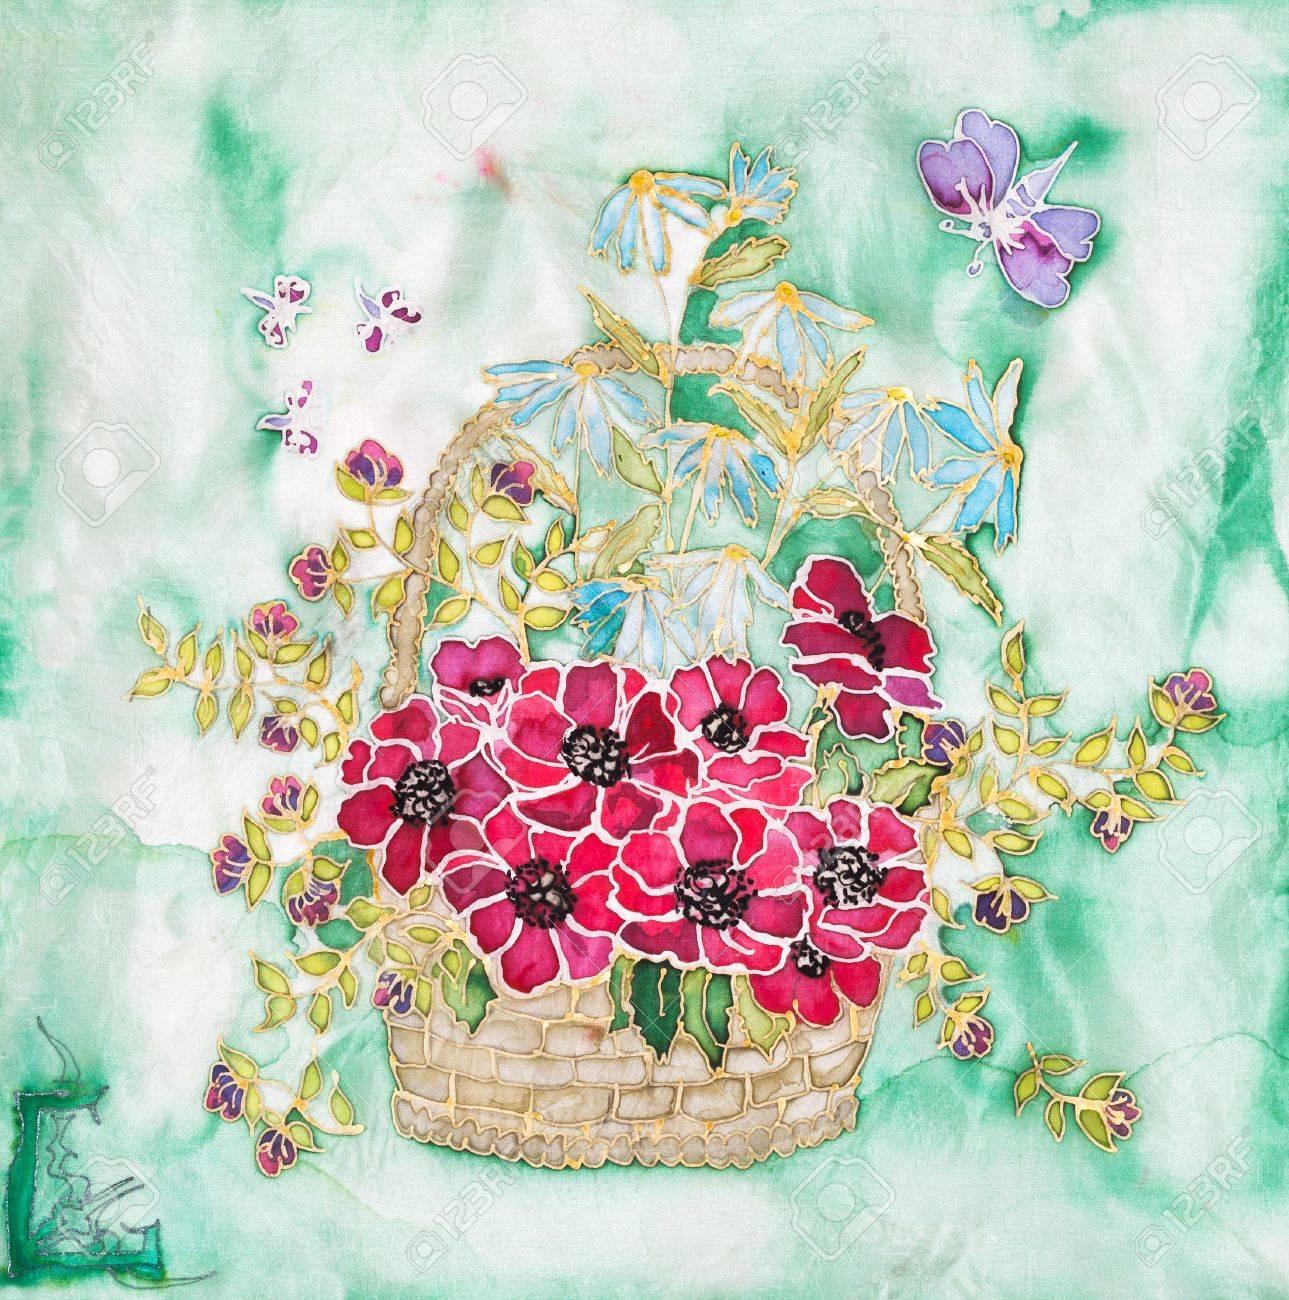 Silk Painting Designs Flowers Best Painting 2018